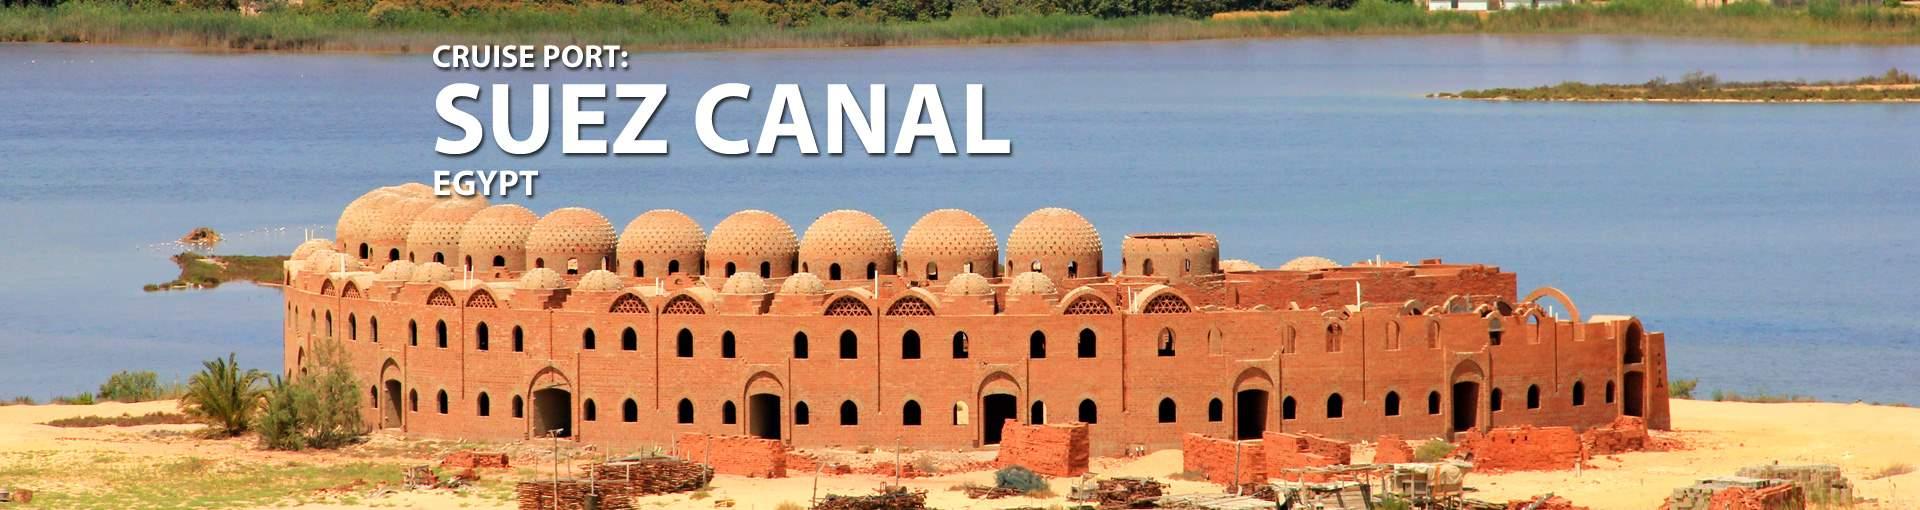 Cruises to Suez Canal, Egypt